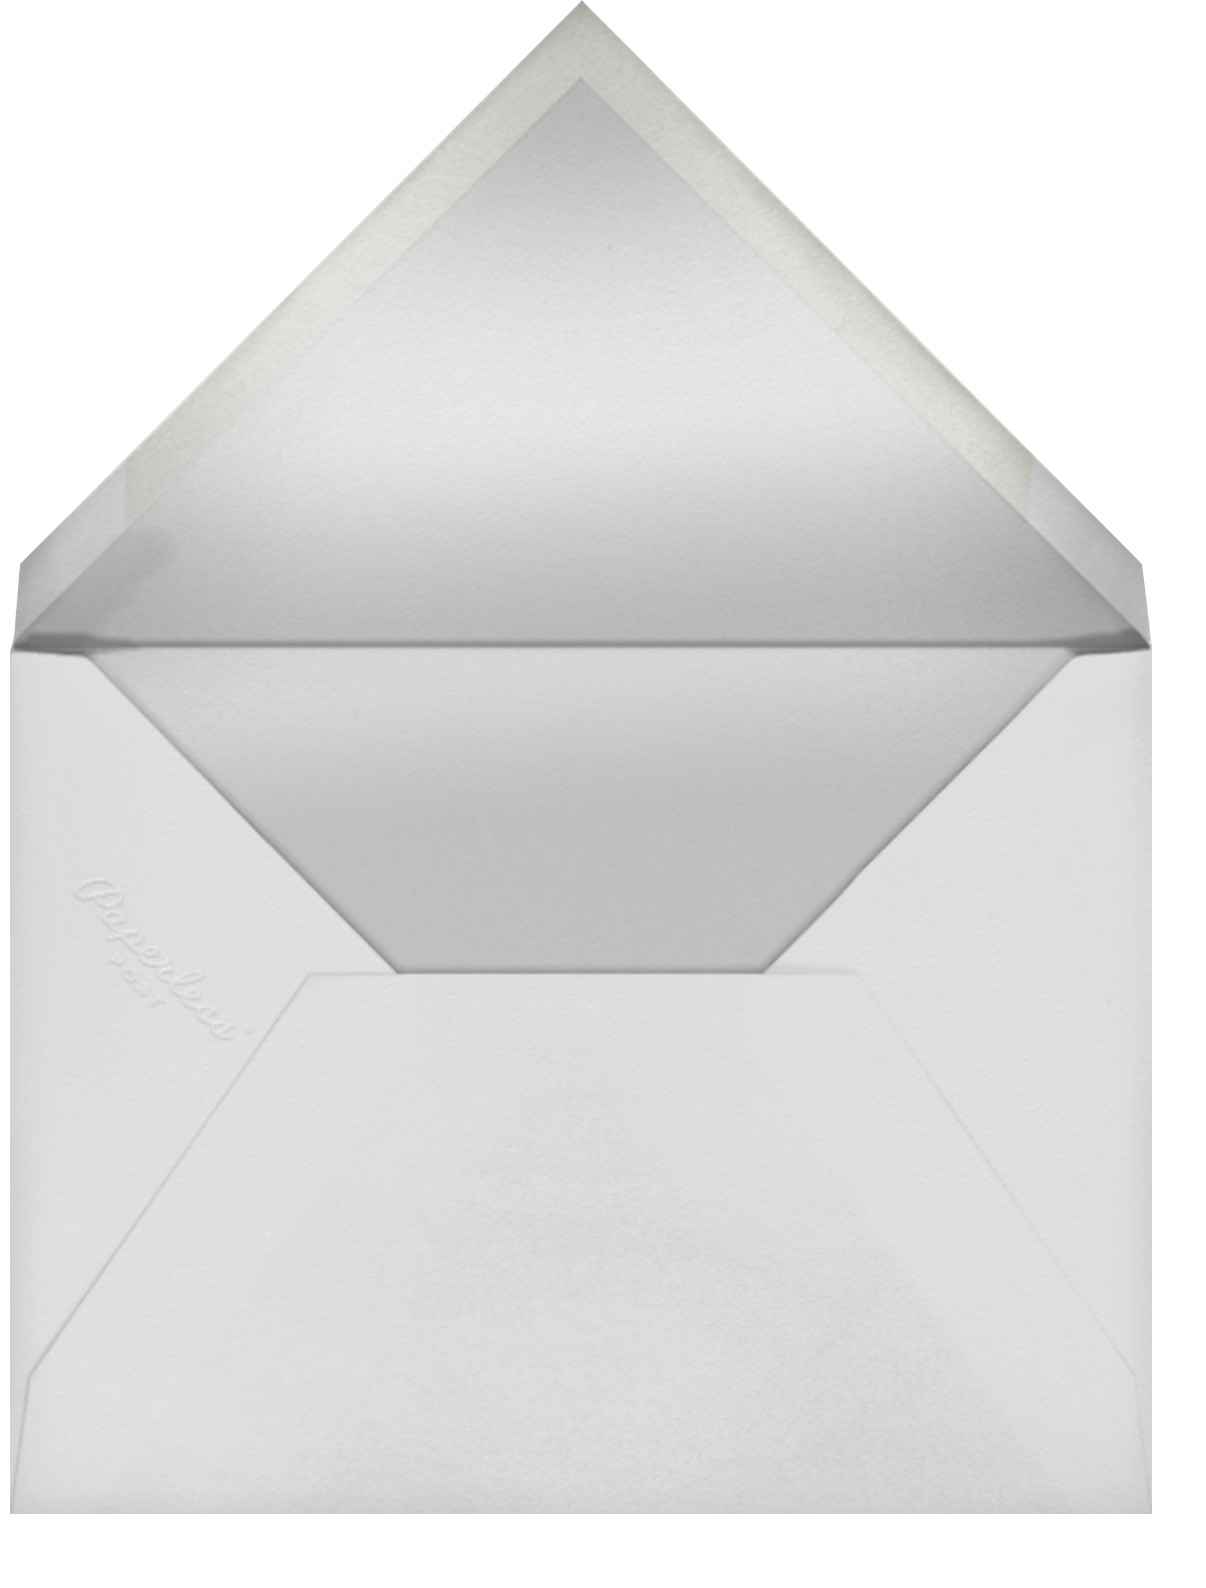 Ikat Dot (Menu) - Light Pink - Oscar de la Renta - Menus - envelope back